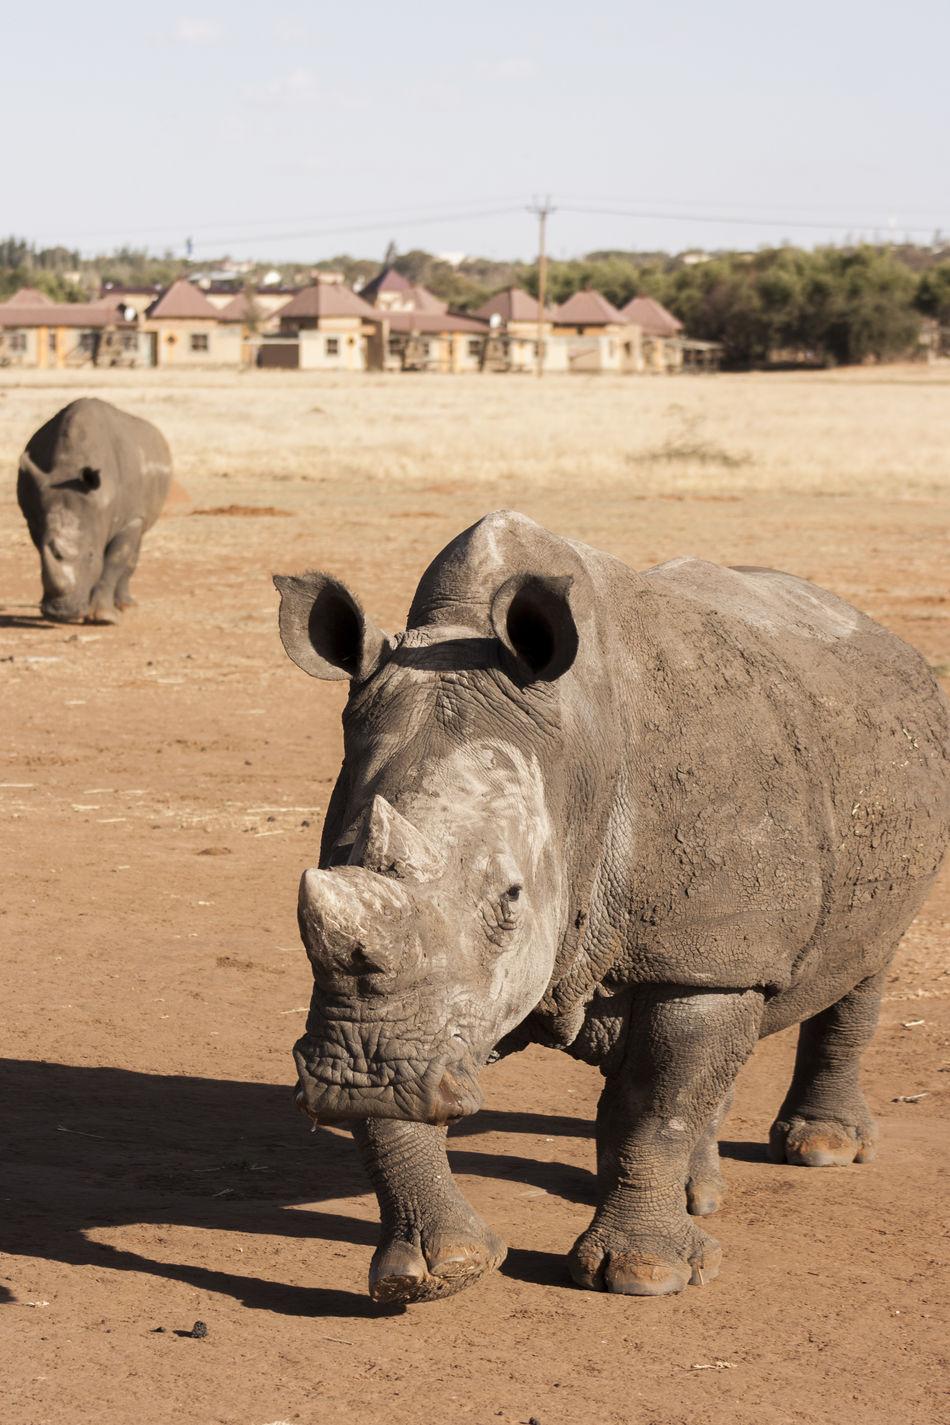 Africa Animal Animal Themes Animals Beauty In Nature Day Endangered Animals Endangered Species EyeEm EyeEm Nature Lover Mammal Nature No People Outdoors Rhino Rhinos Sand Wildlife